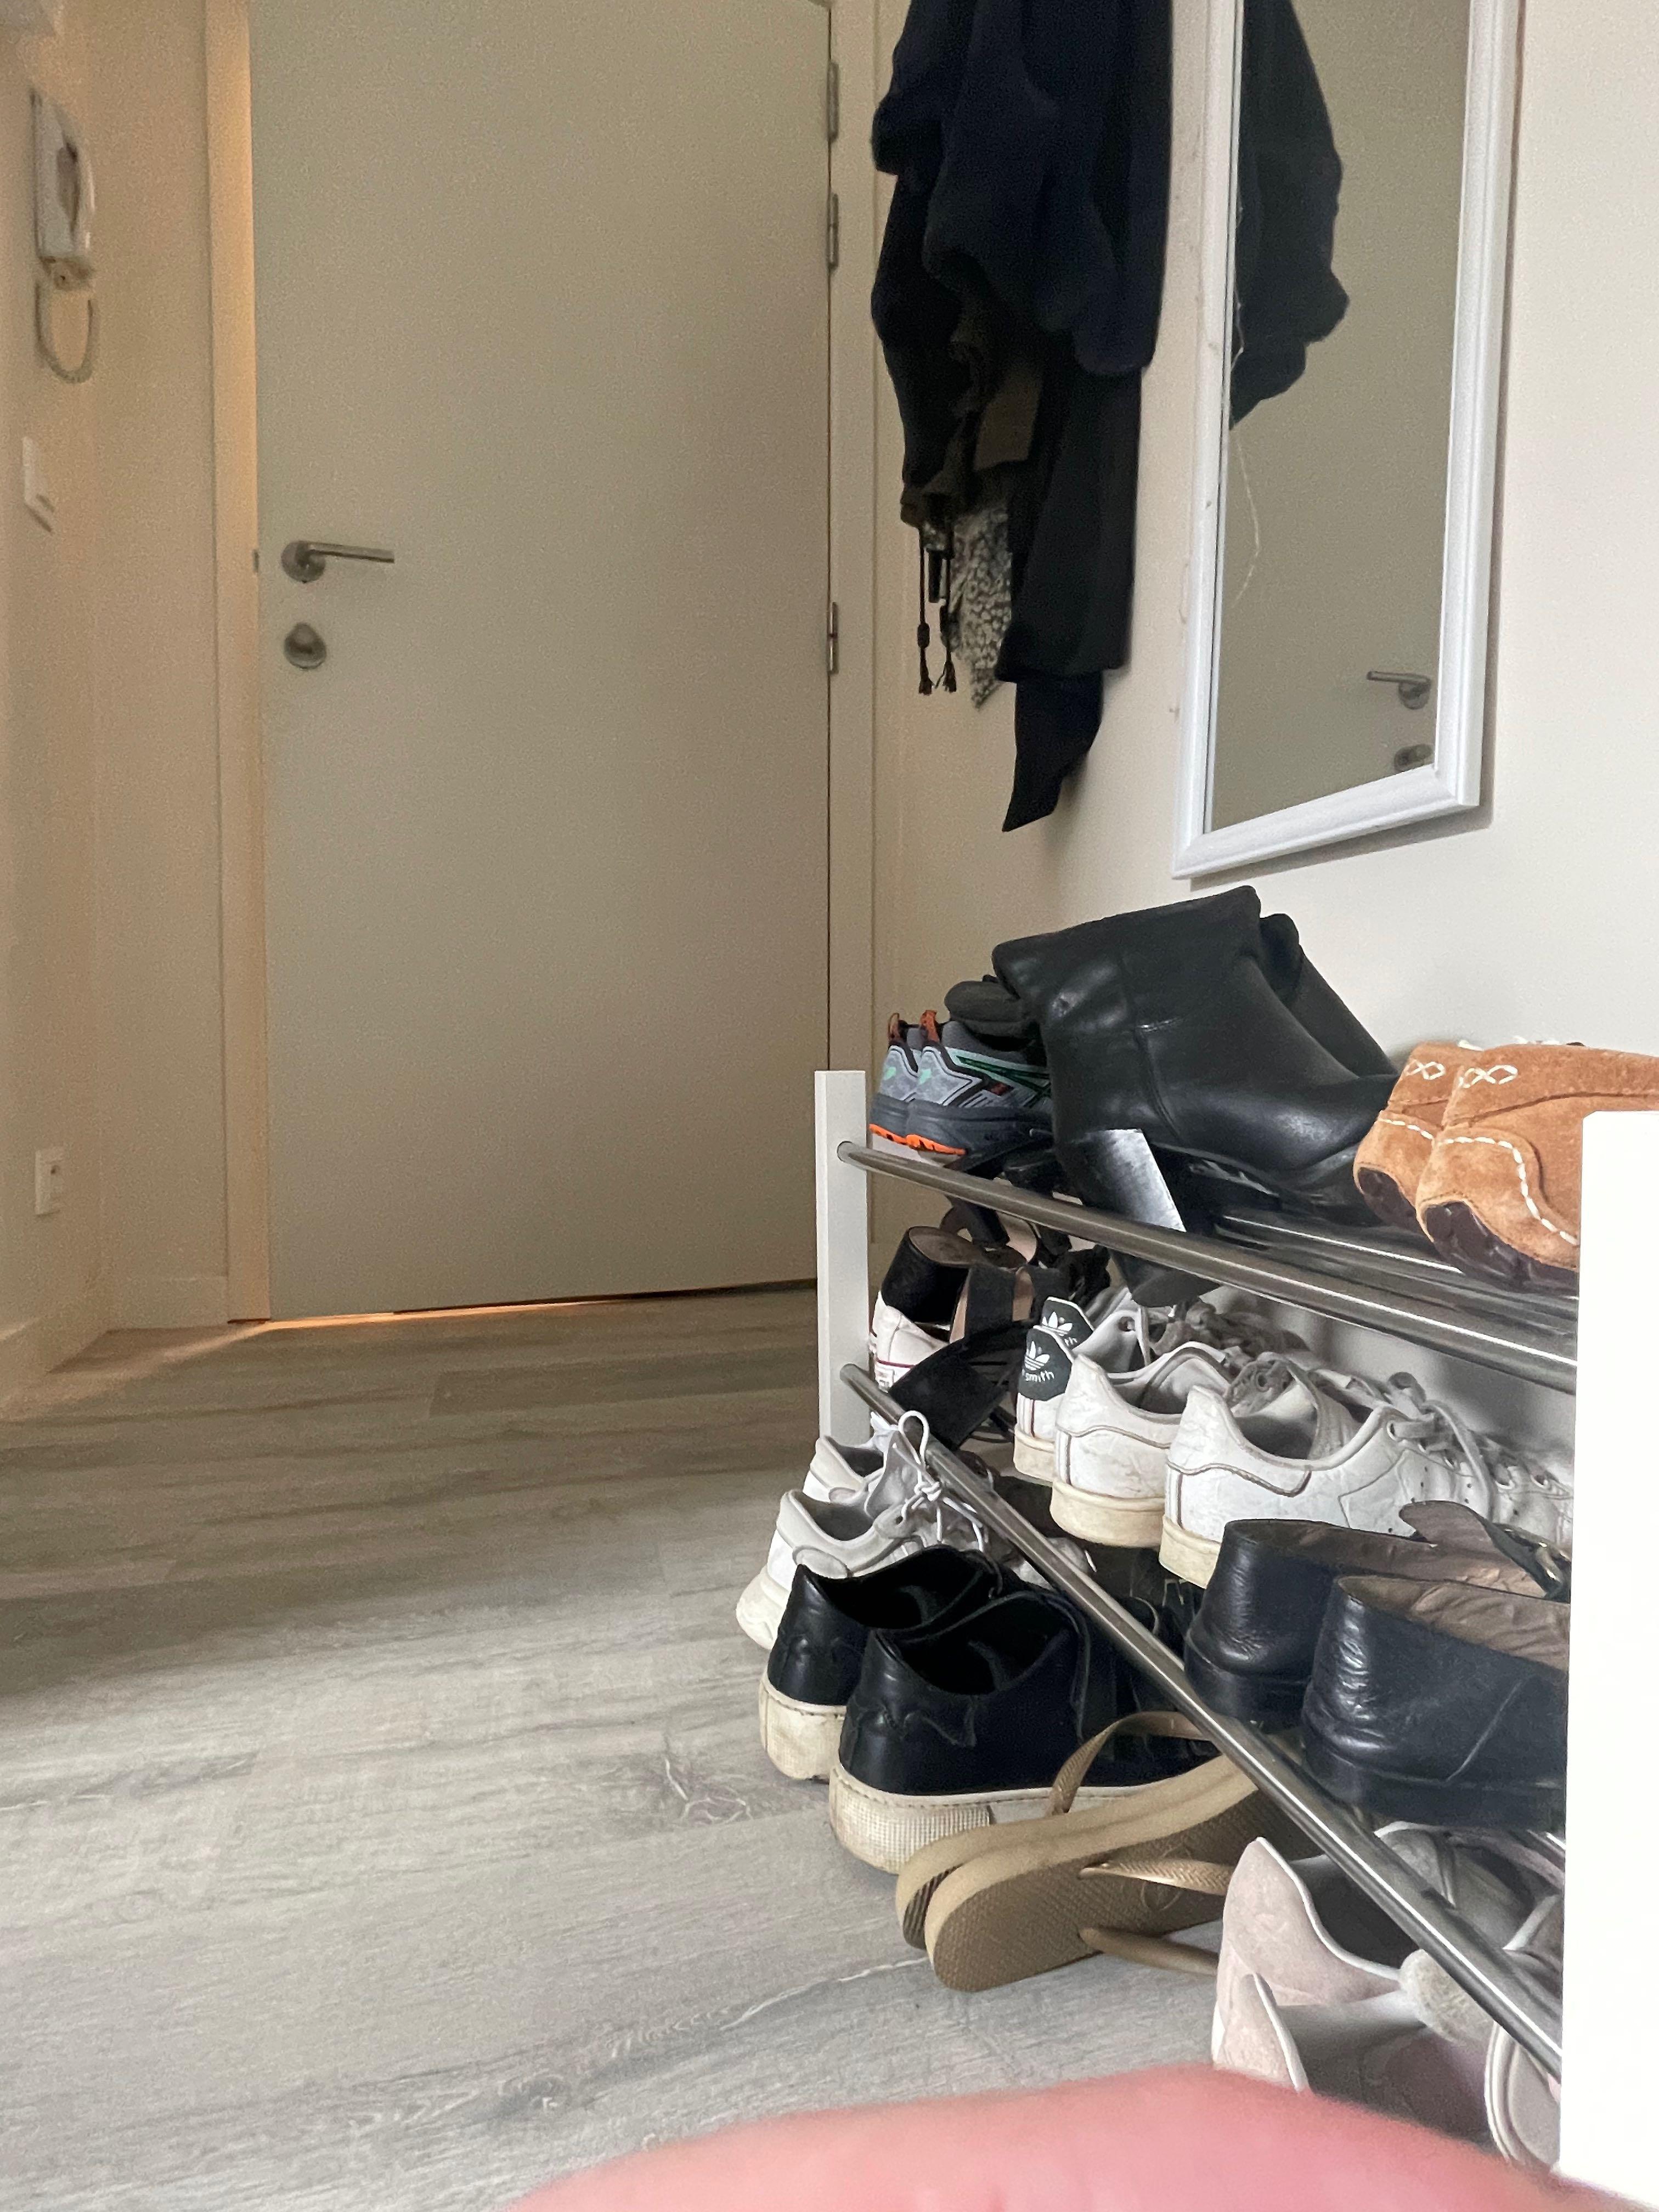 DB12-0202 - shoes